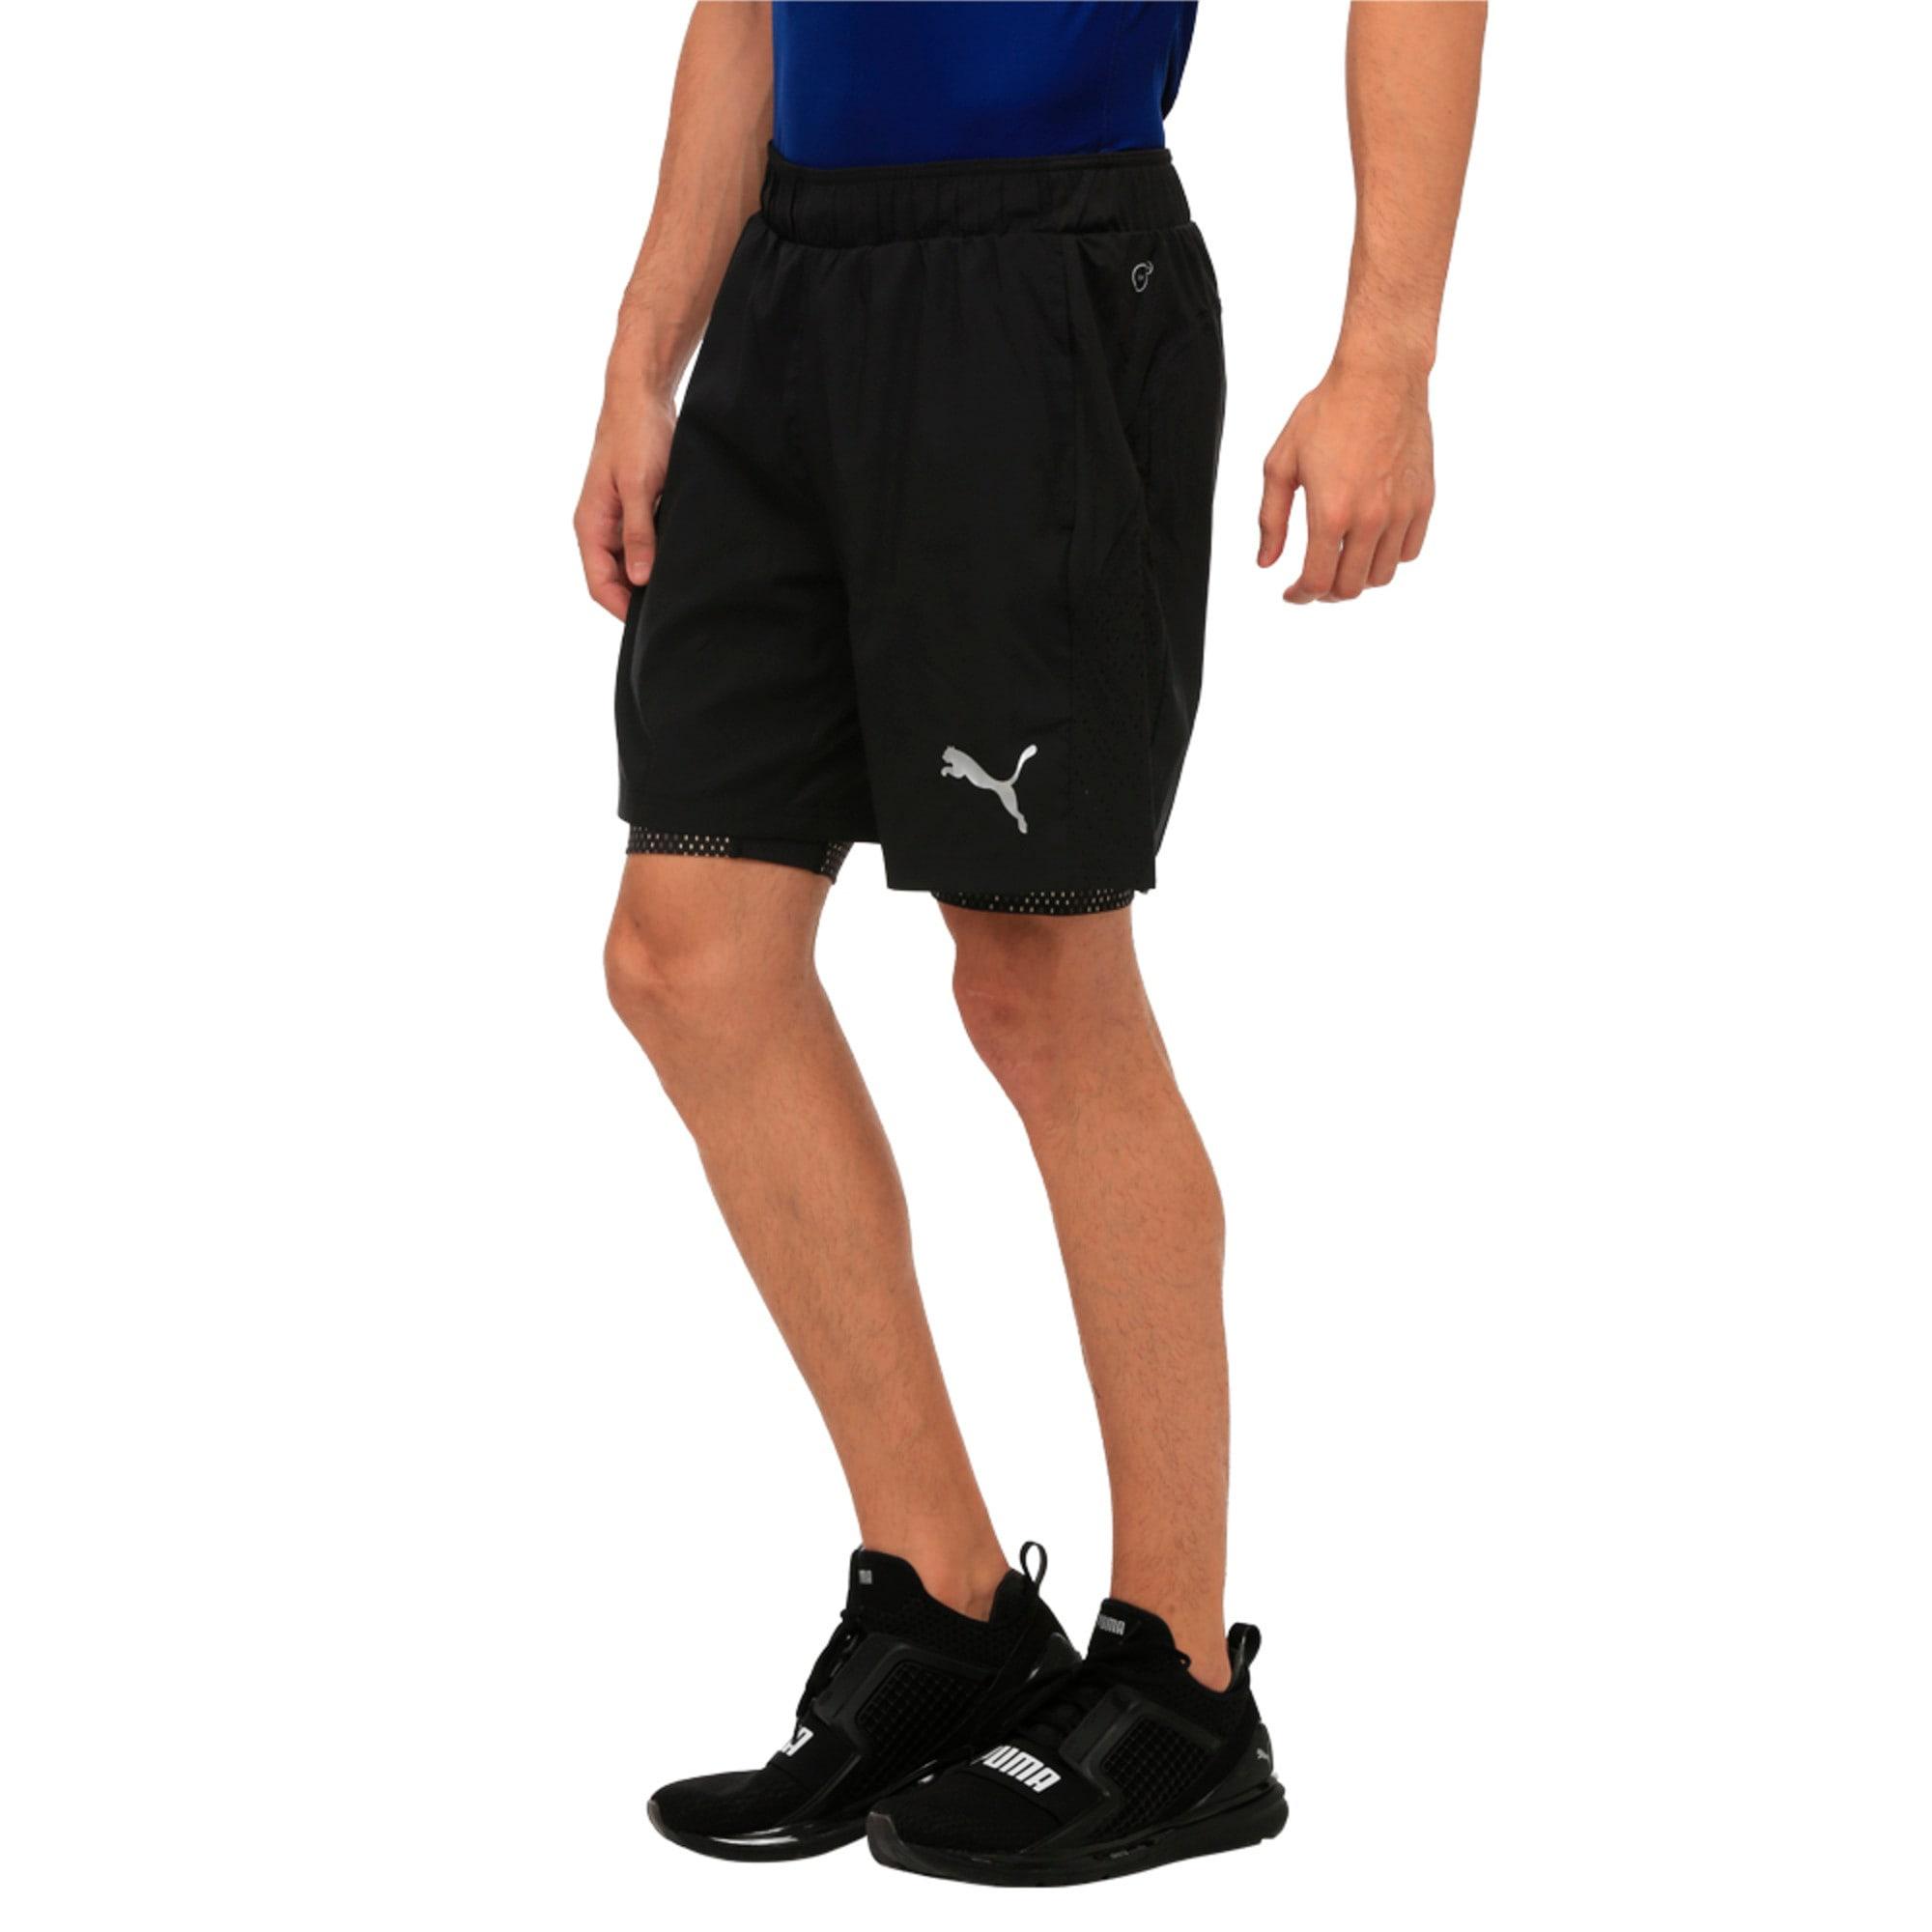 Thumbnail 2 of Active Training Men's 2 in 1 Shorts, Puma Black, medium-IND